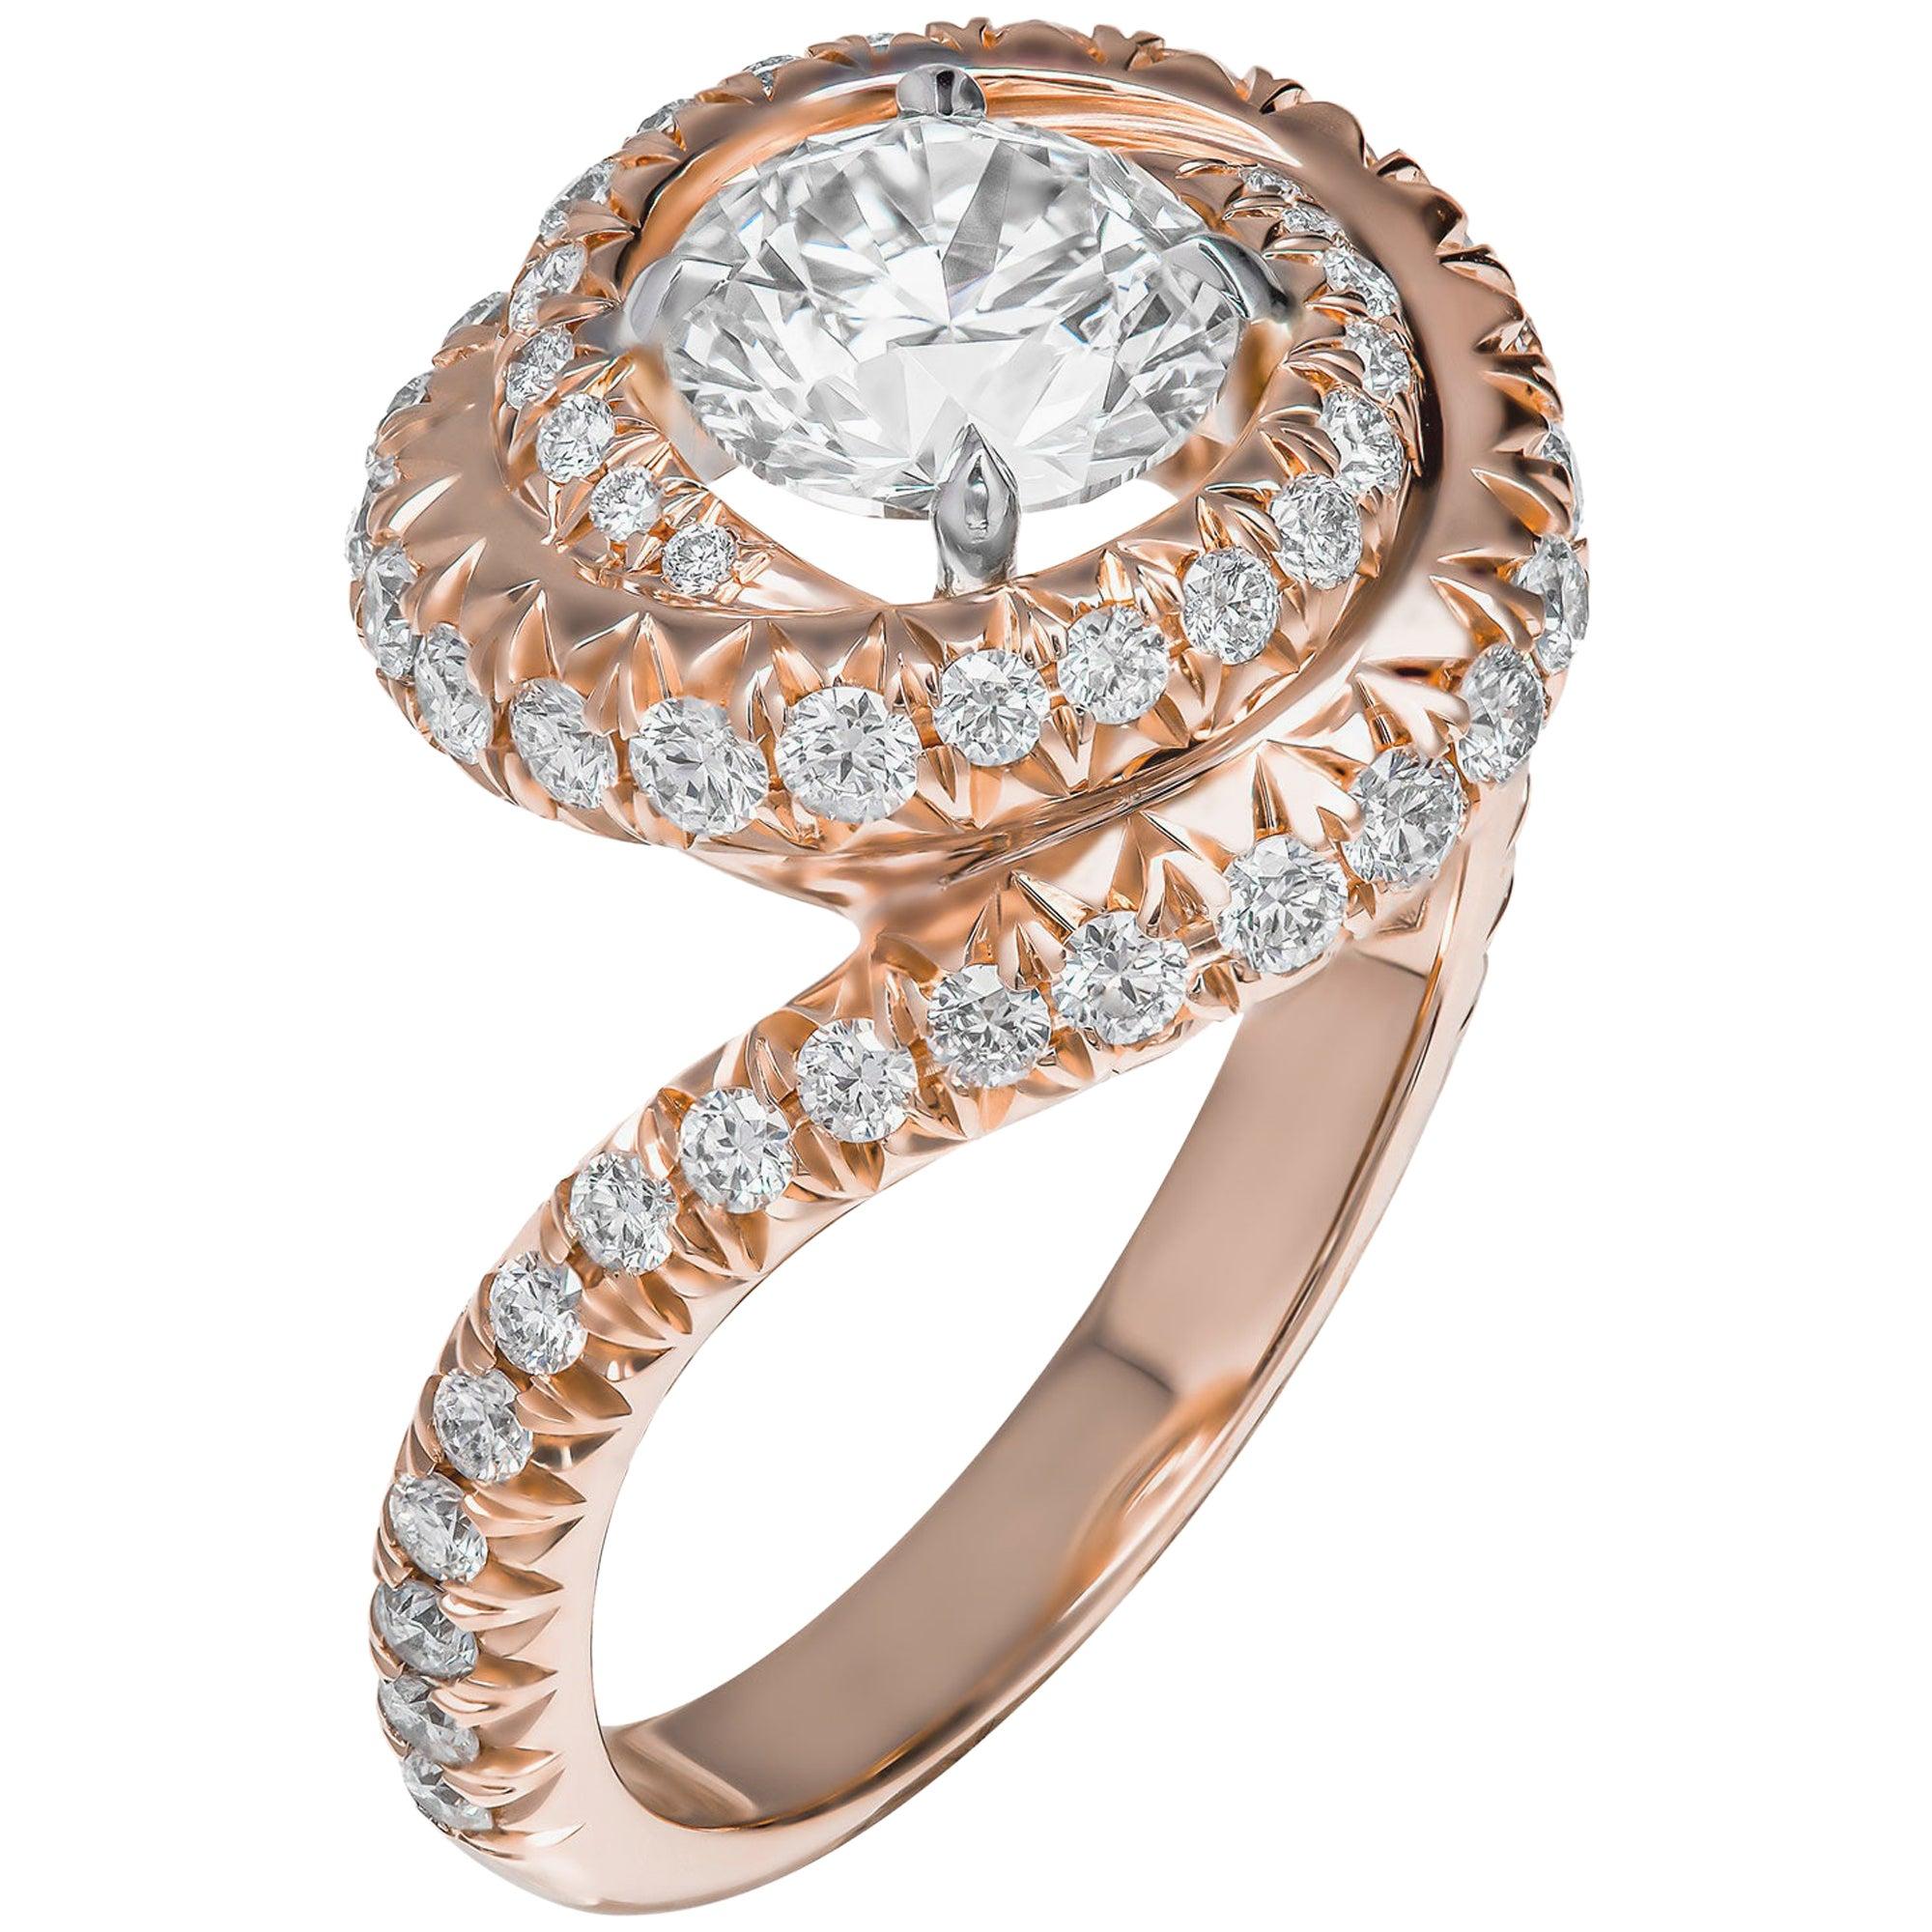 GIA Certified Diamond Swirl Cocktail Ring with 1.30 Carat Round Diamond